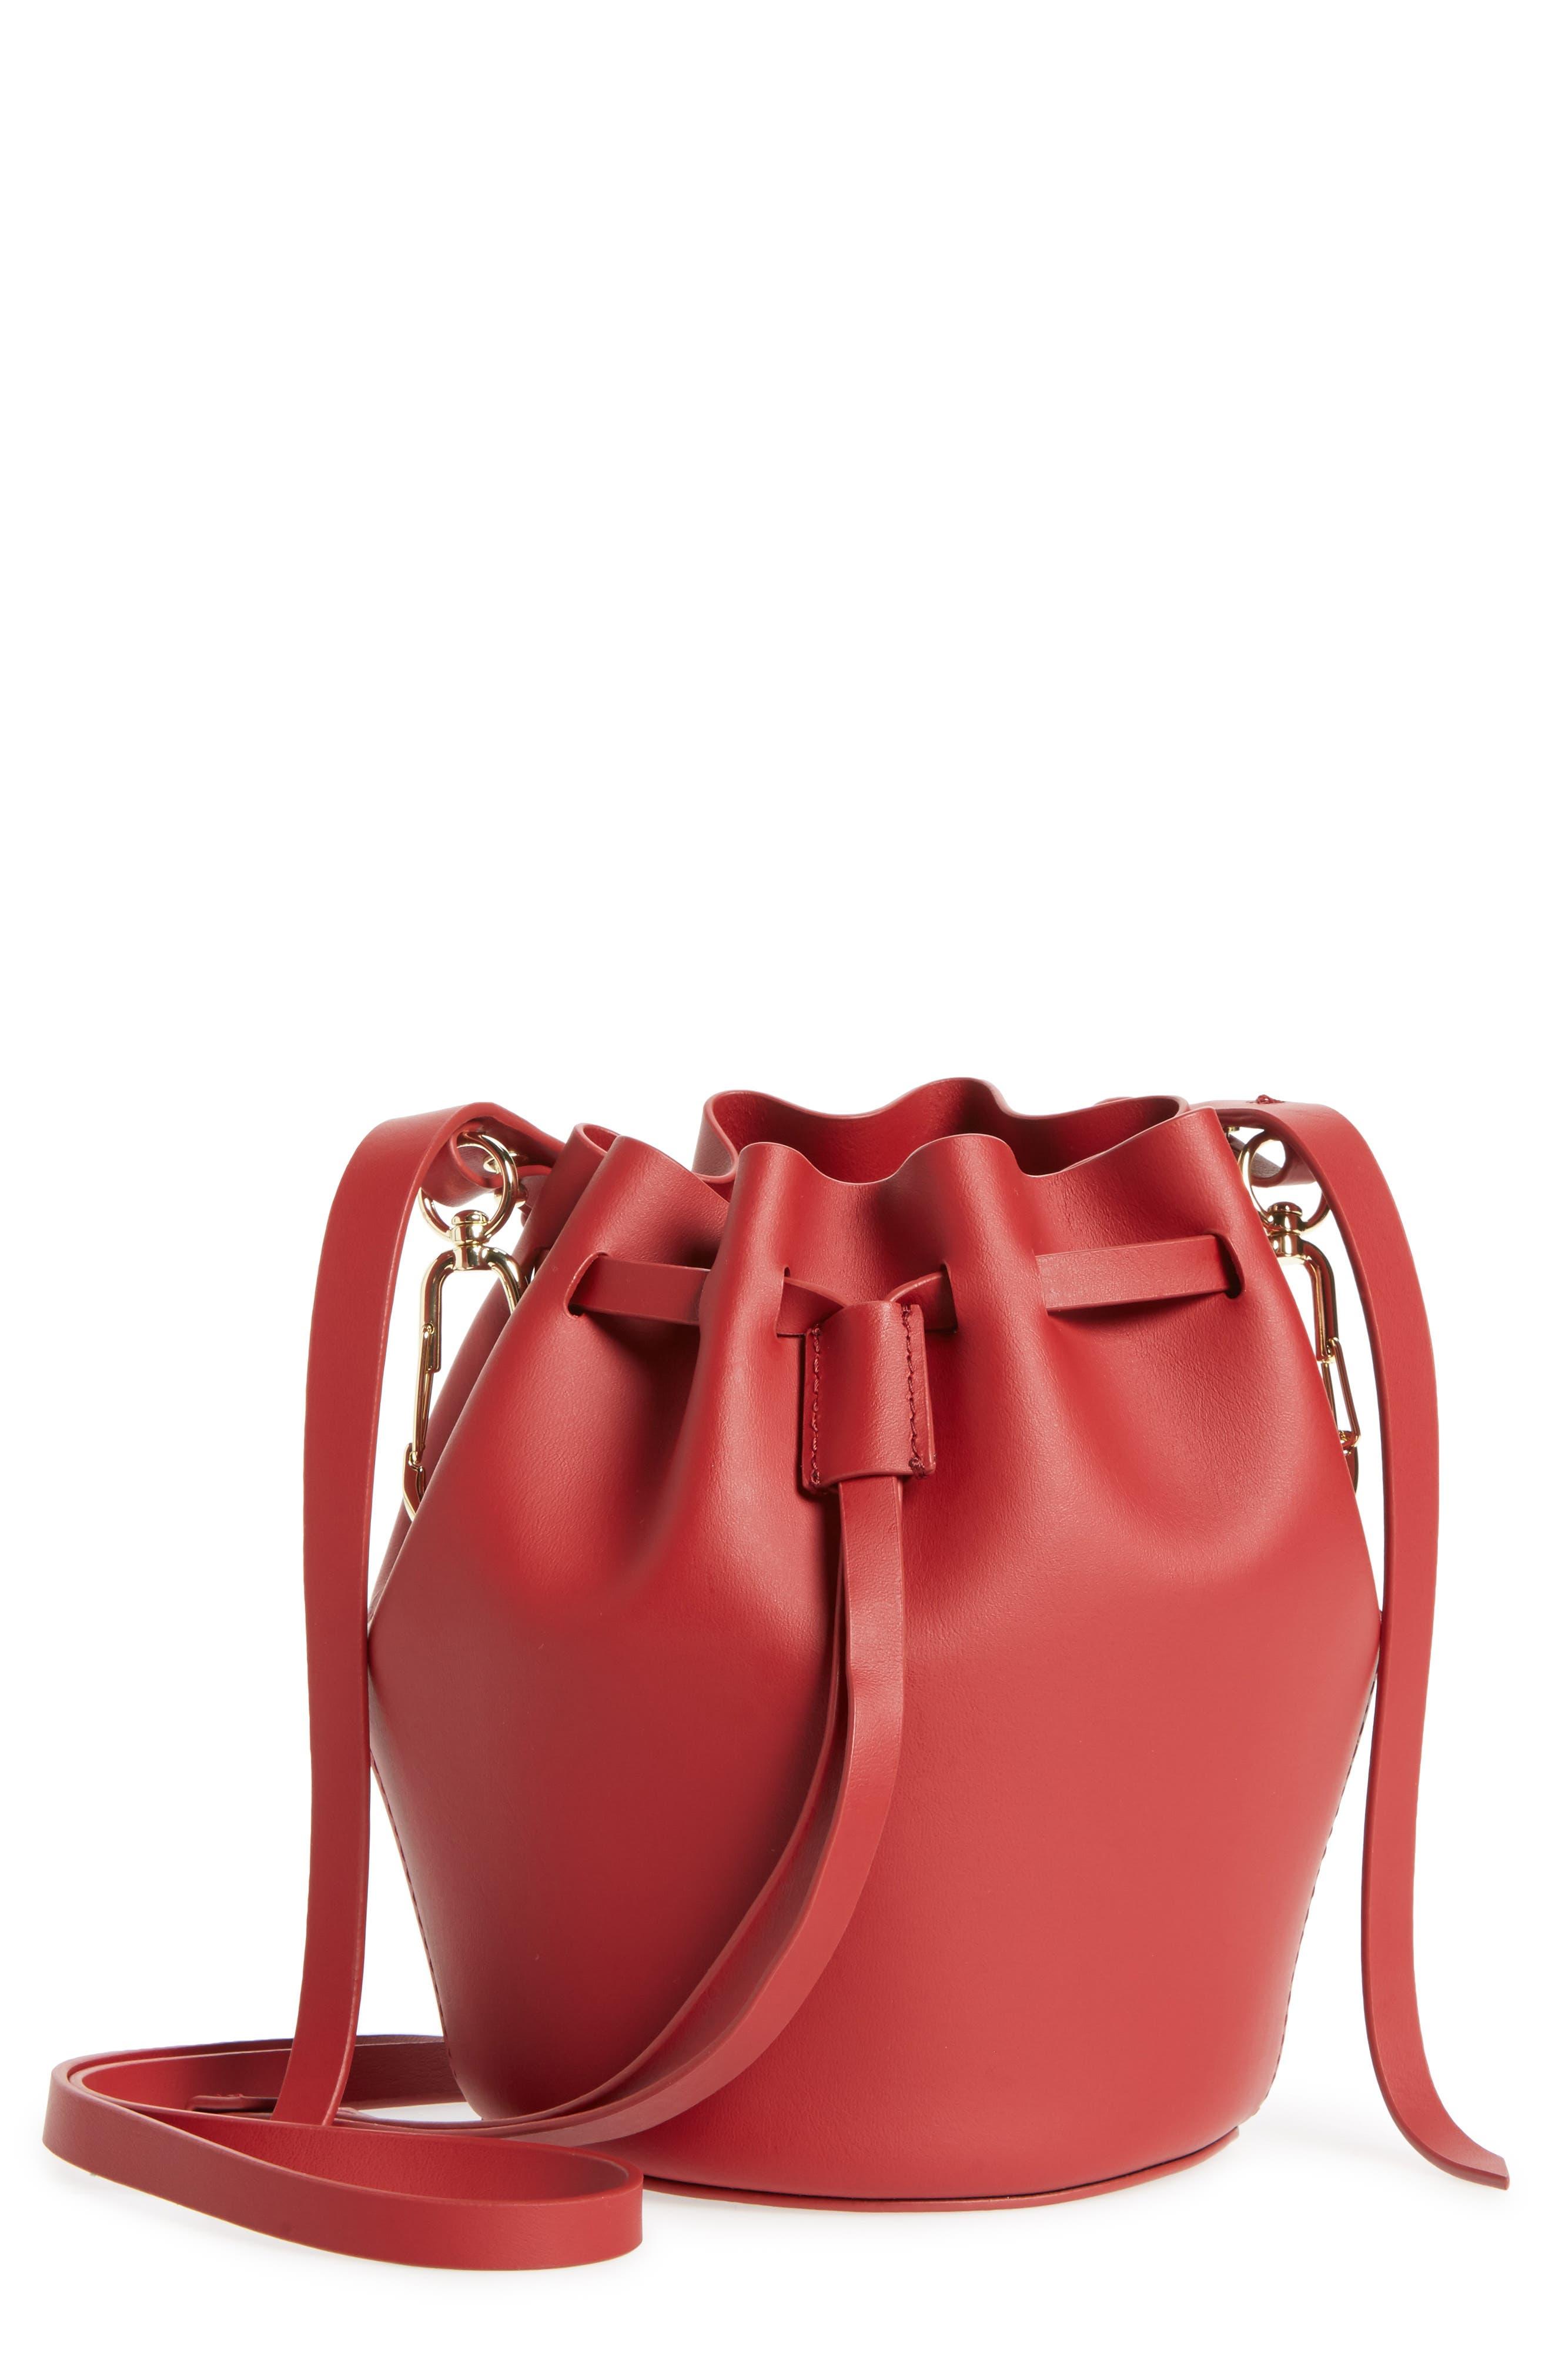 Main Image - ZAC Zac Posen Mini Belay Calfskin Leather Drawstring Bag